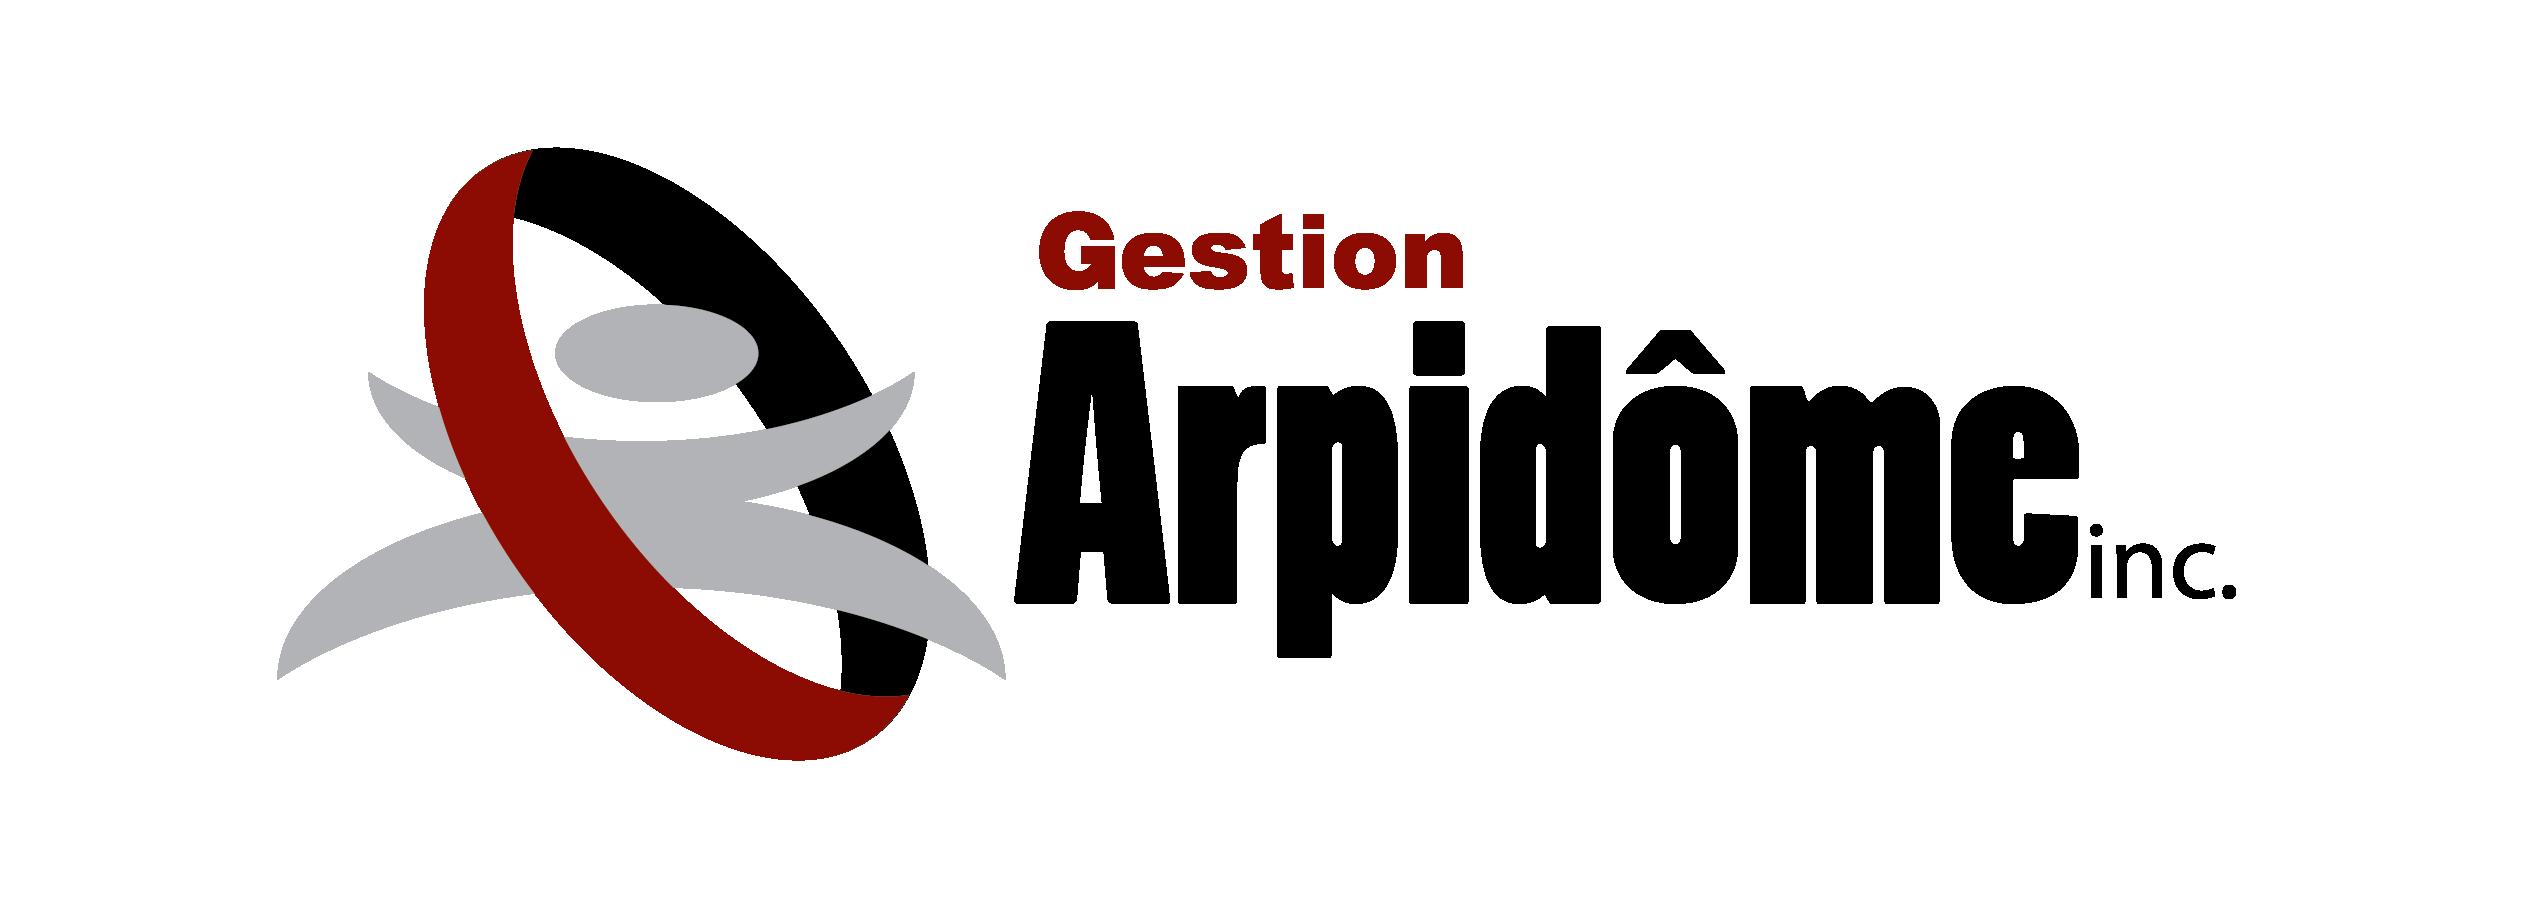 logo de Gestion Arpidôme